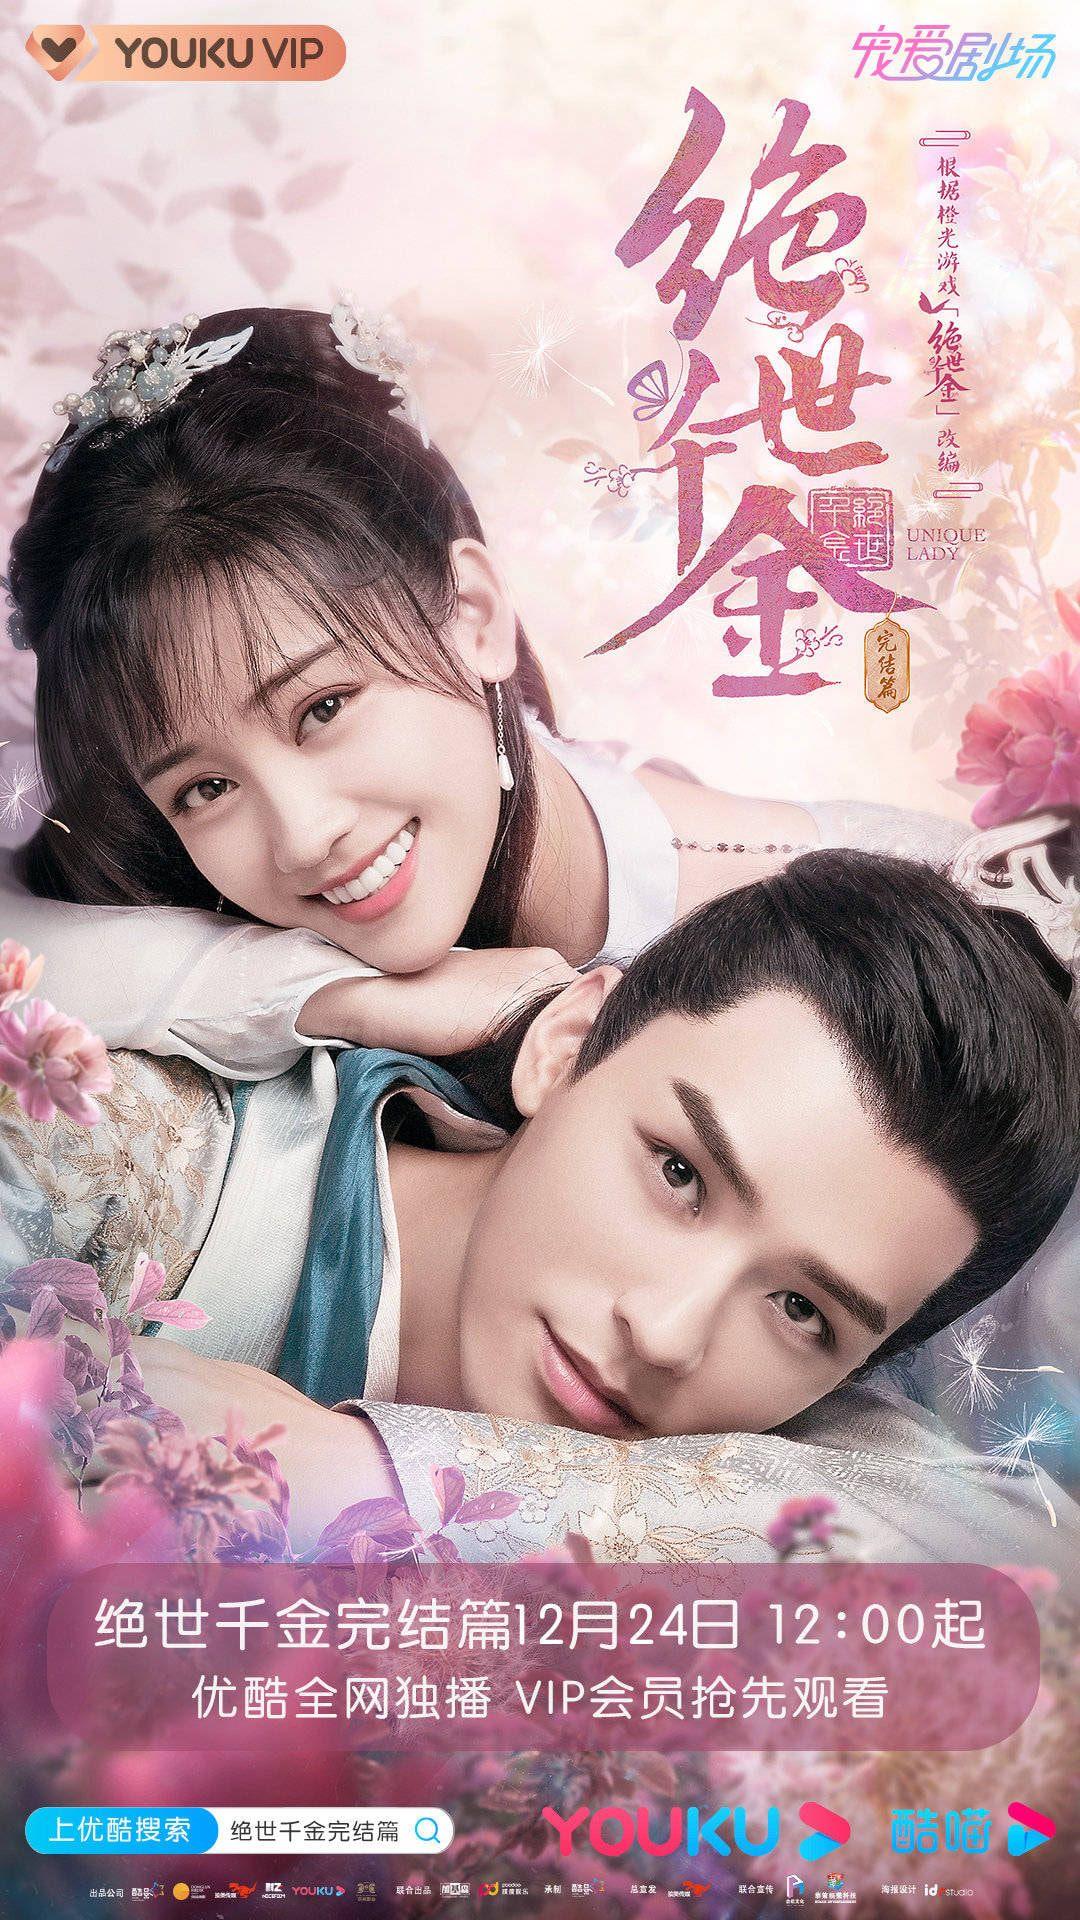 Thiên Kim Háo Sắc Phần 2 - Unique Lady 2 (2020)